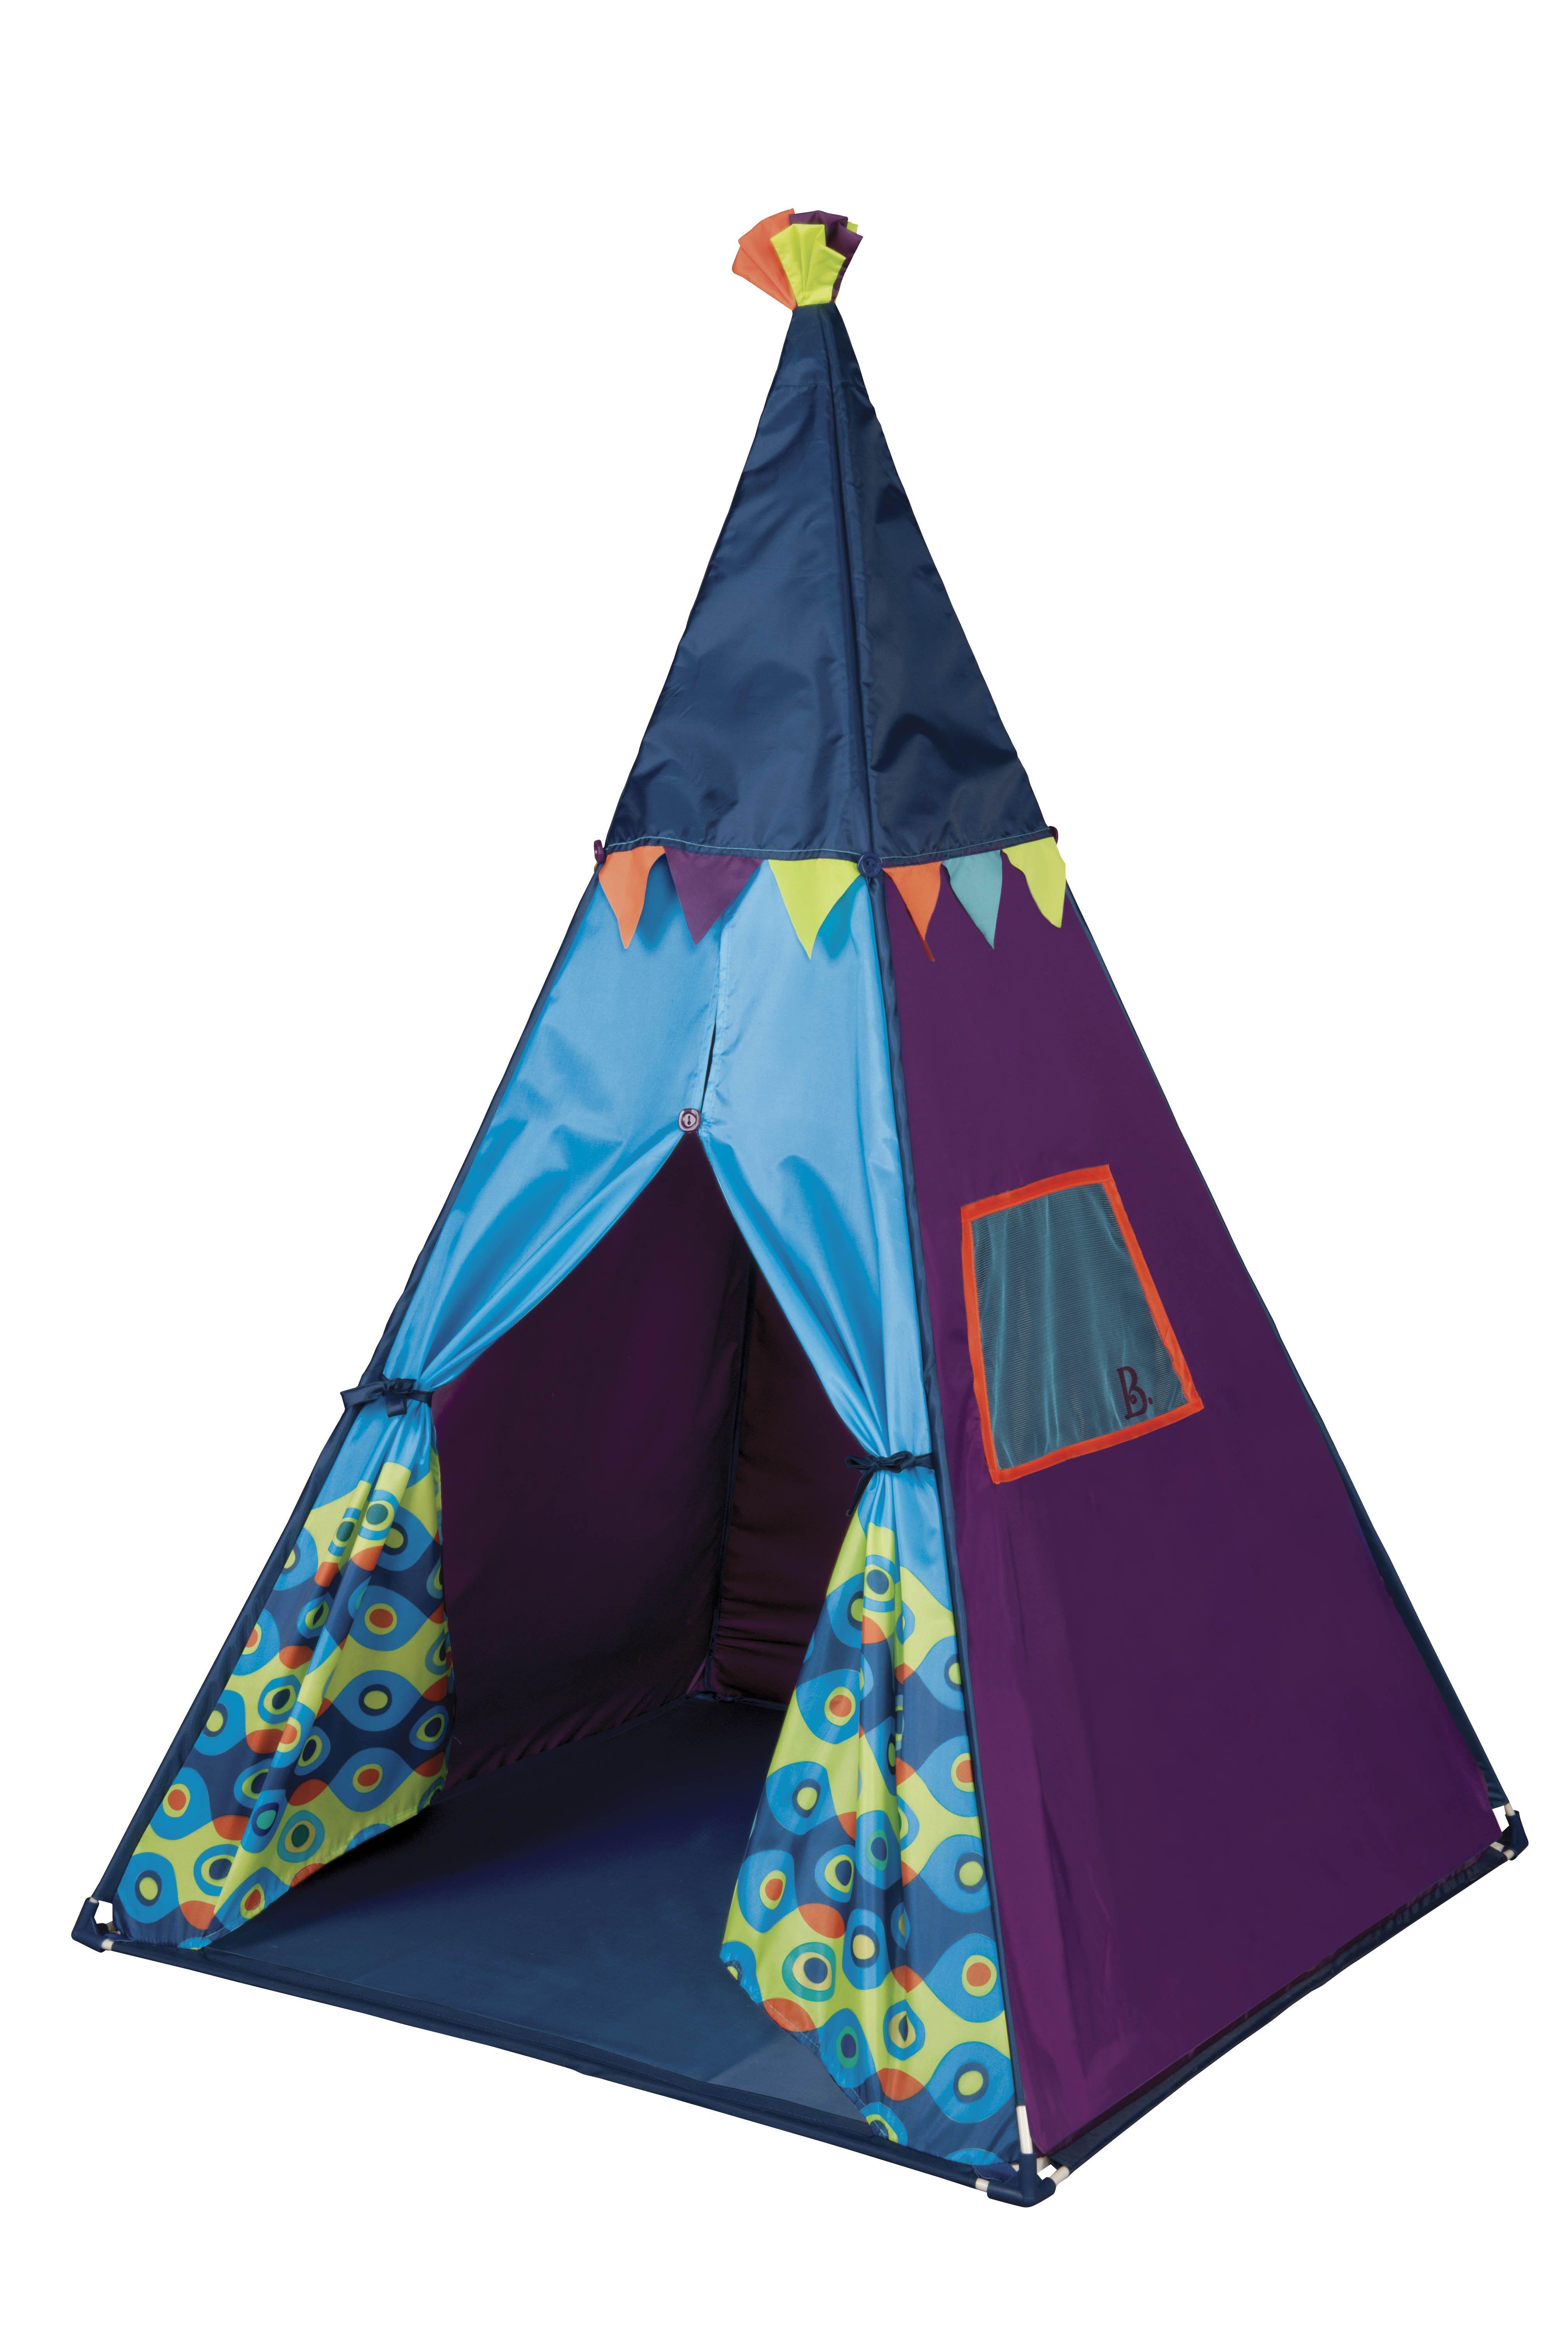 B Teepee Kids Play Tent Lights Up Inside Kids Stuff